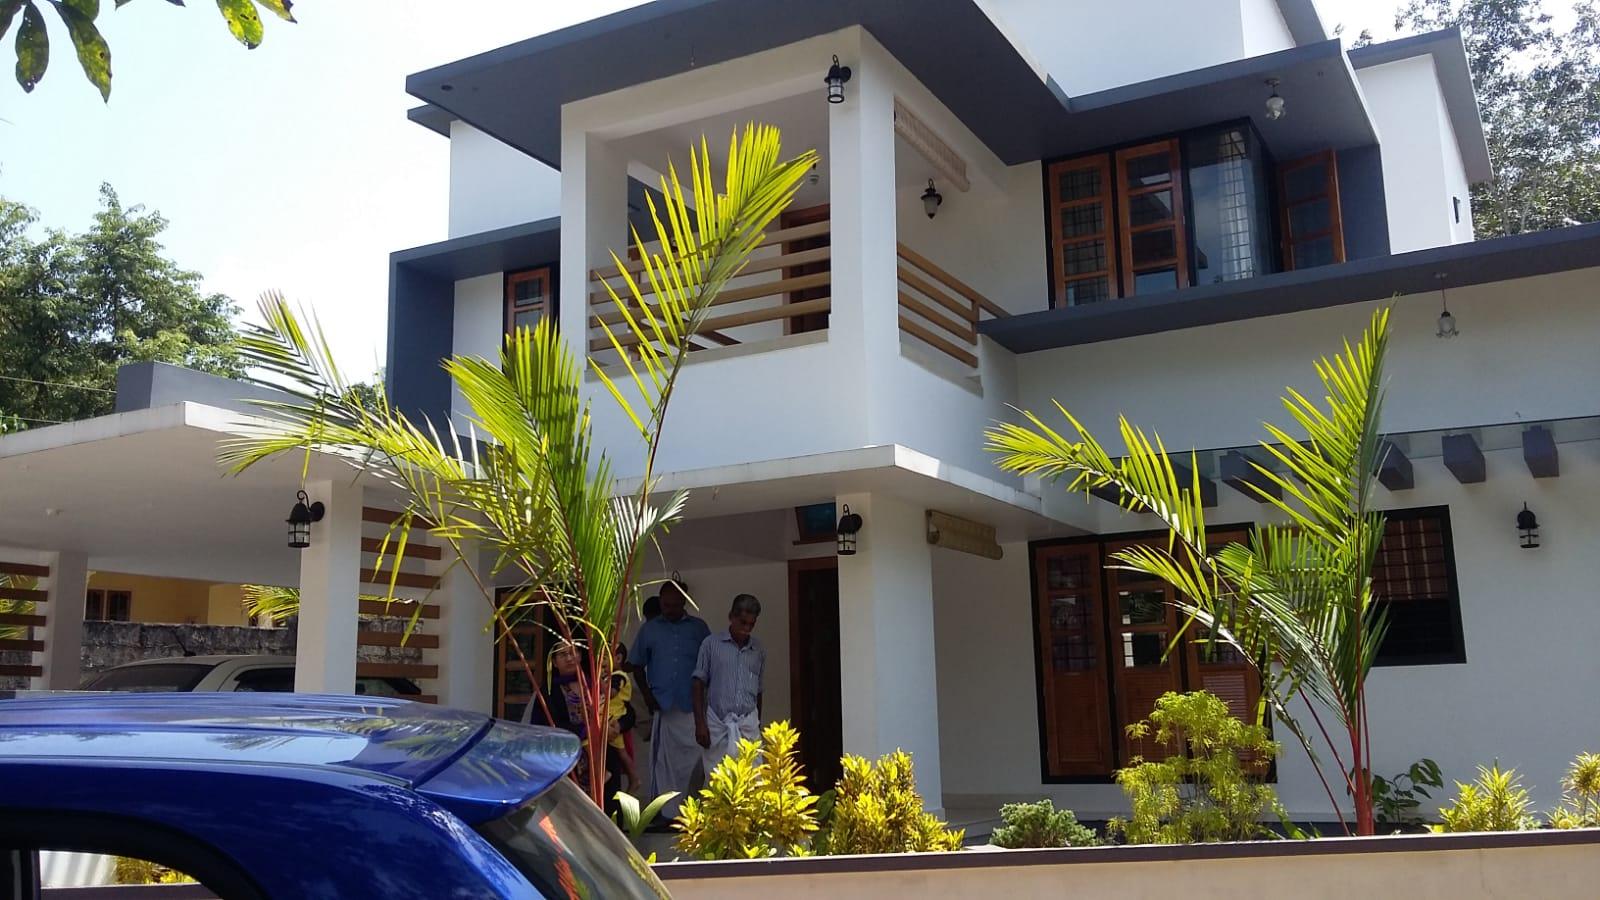 House sale in changanacherry thottakkadu Kottayam .